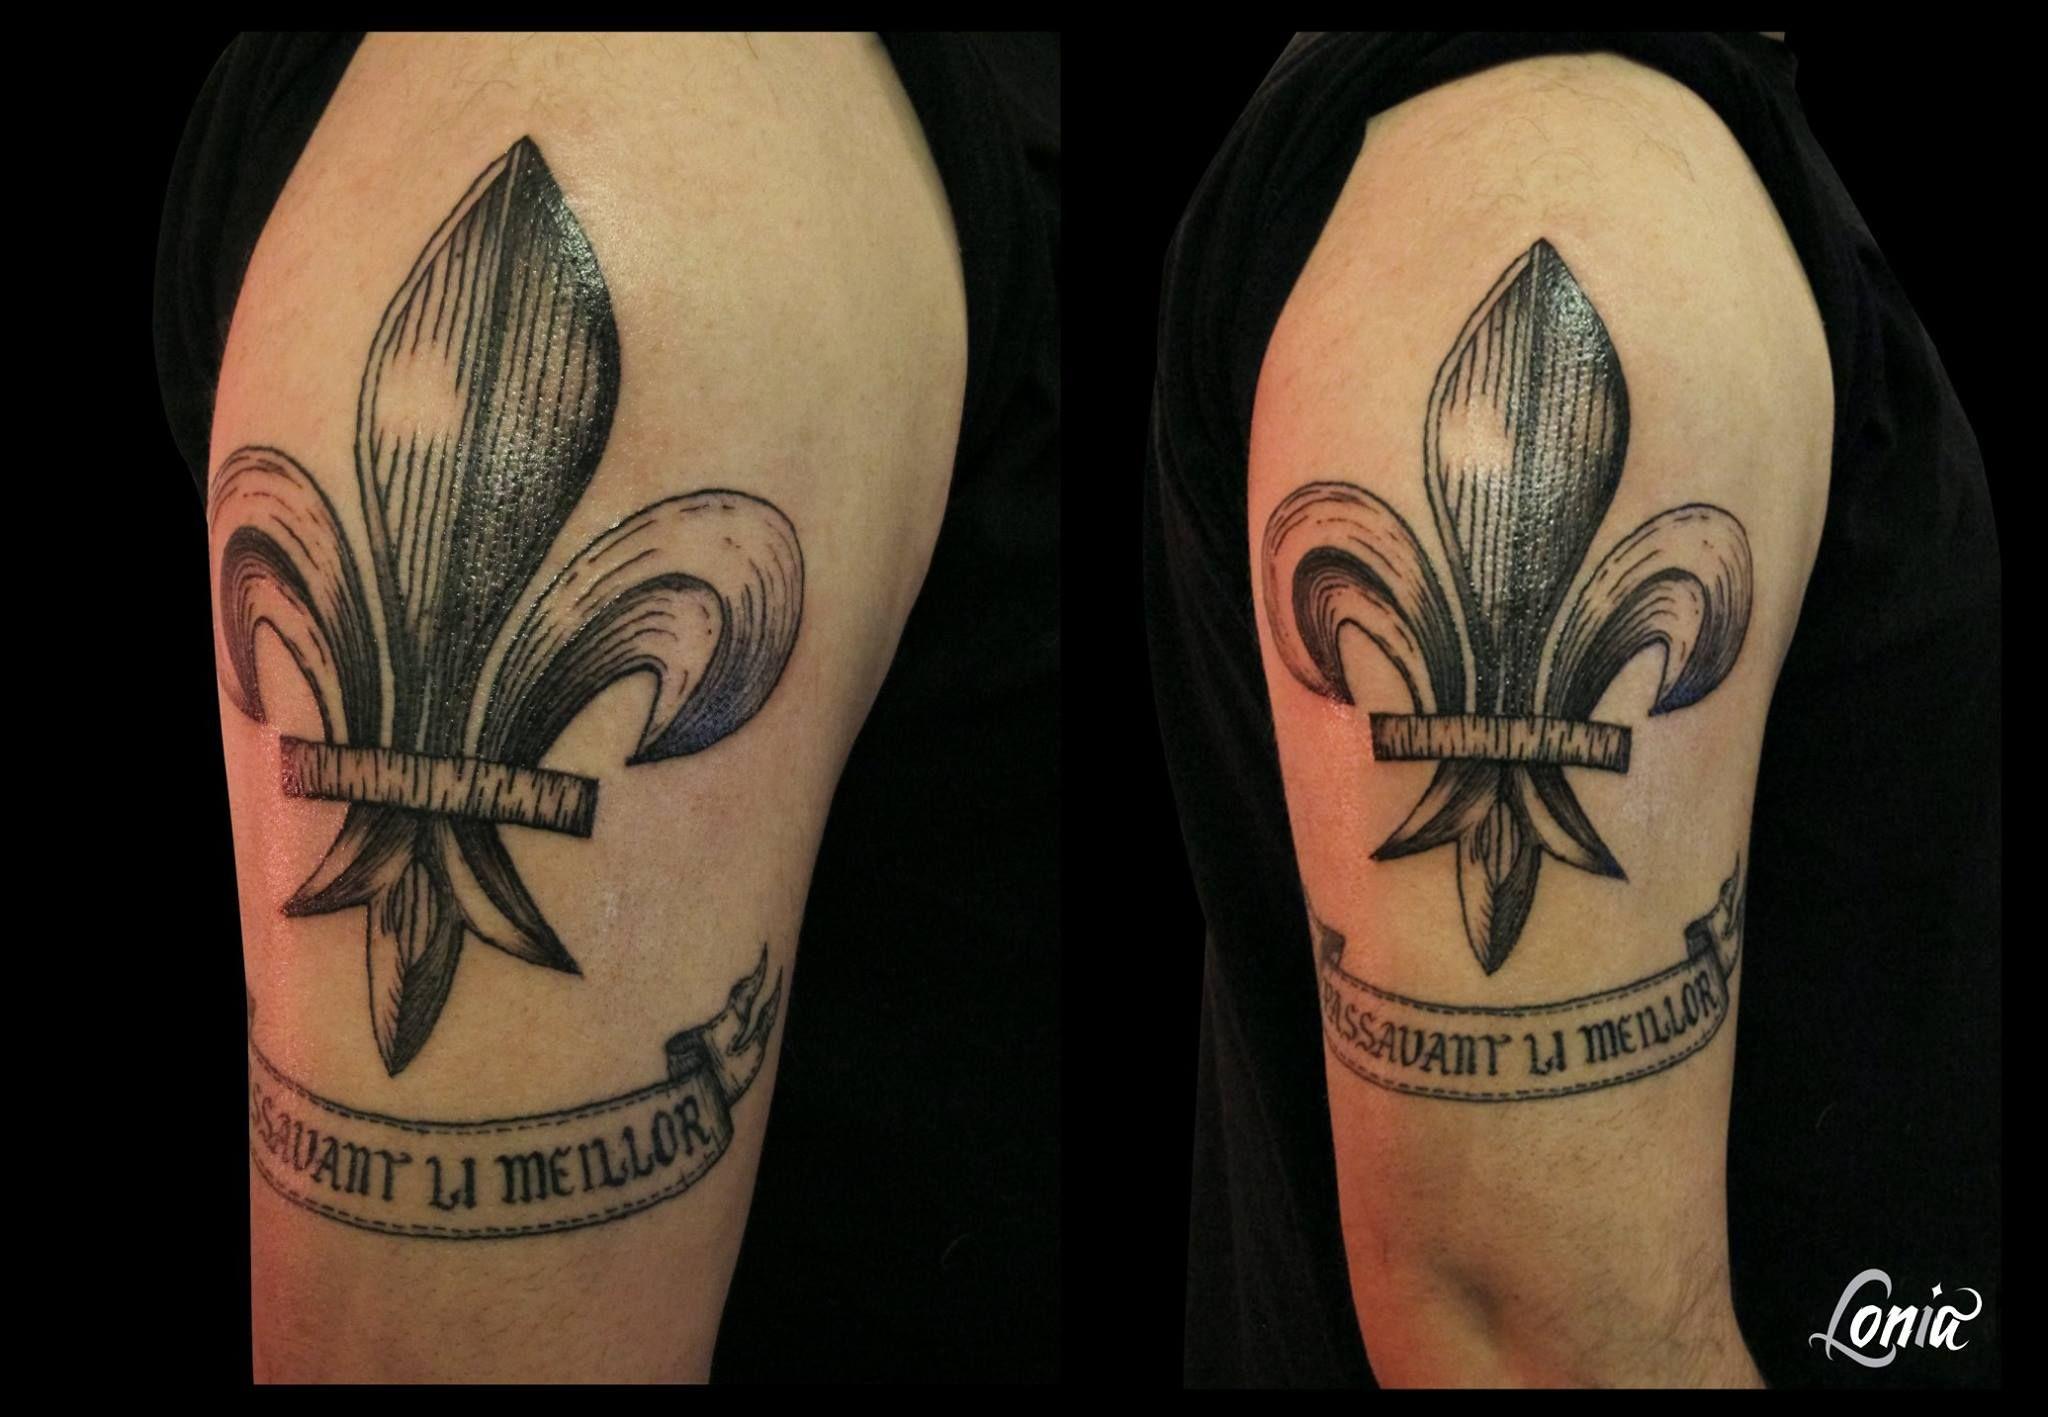 Tatouage Lonia Tattoo Fleur De Lys Gravure Tattoos Tattoos